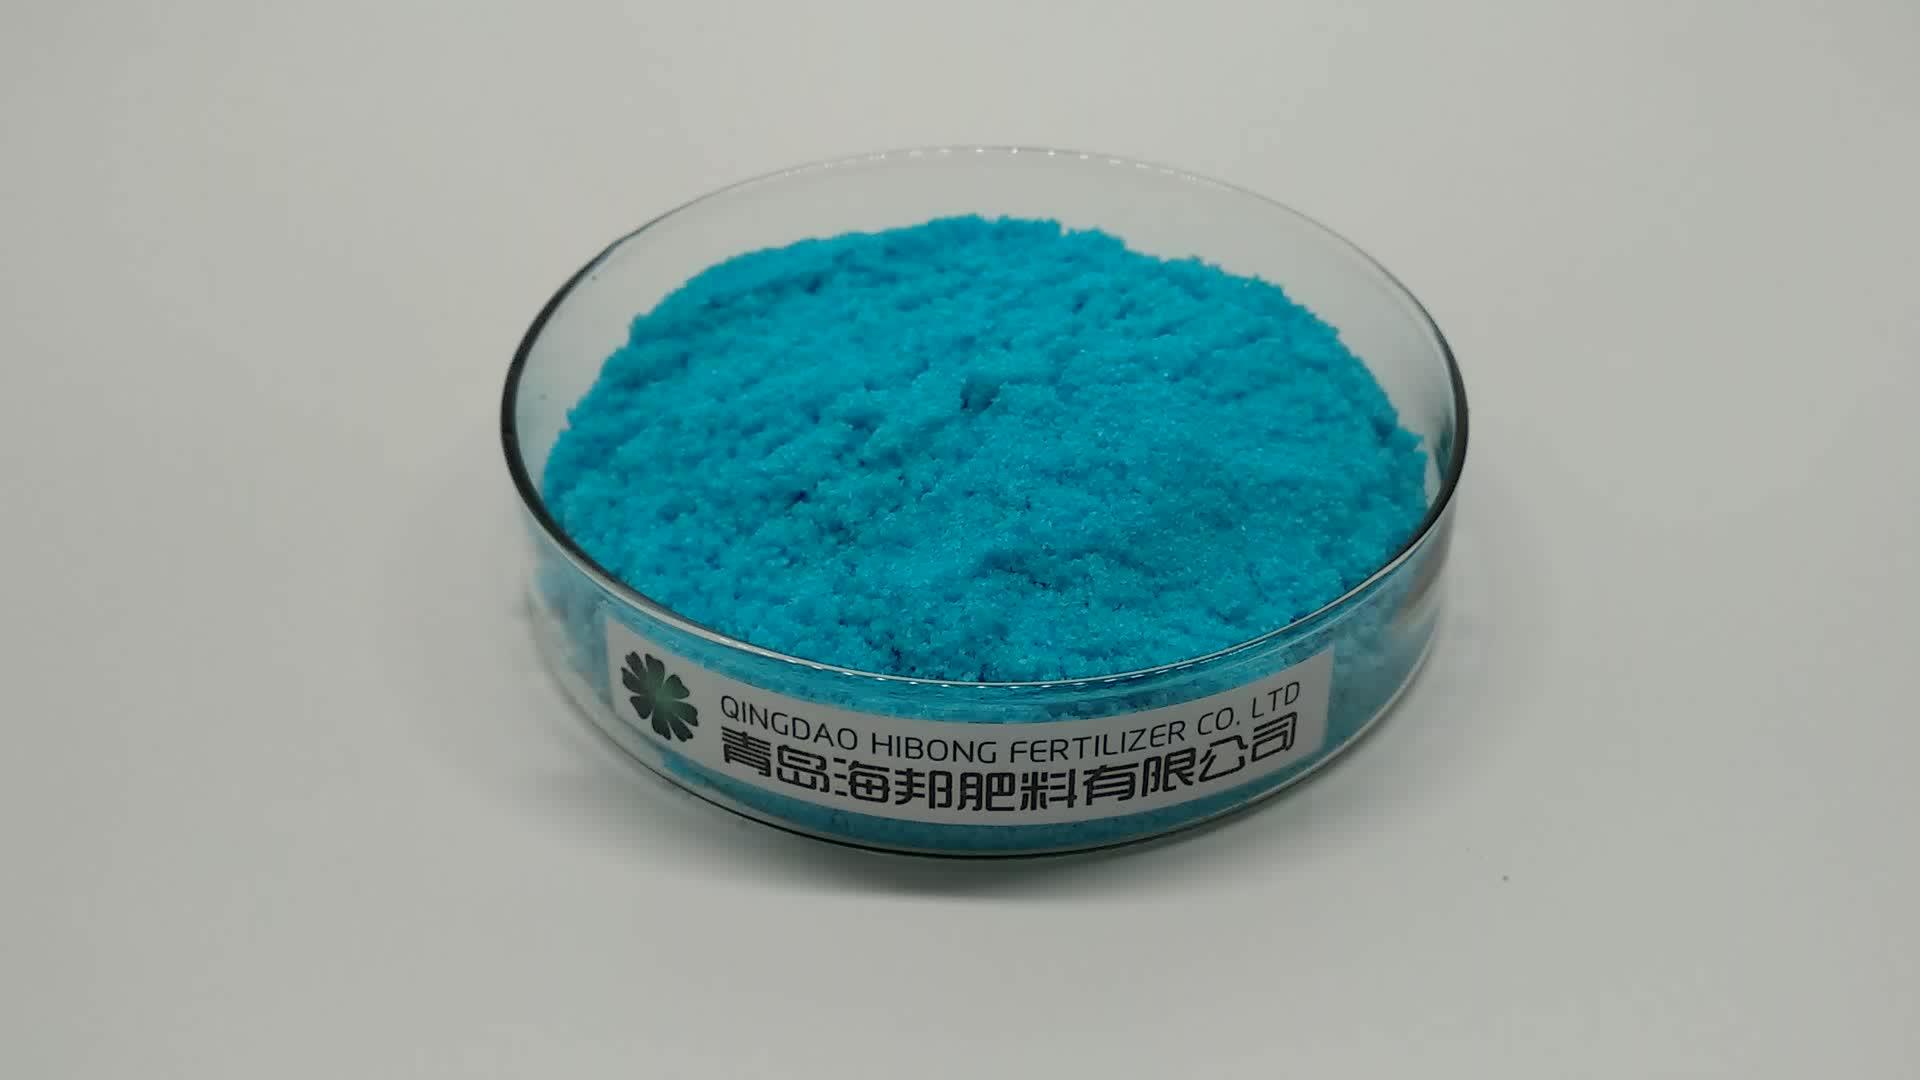 100% große Spur Elemente Wasser Löslich Dünger NPK 20 20 20 nährstoffe dünger